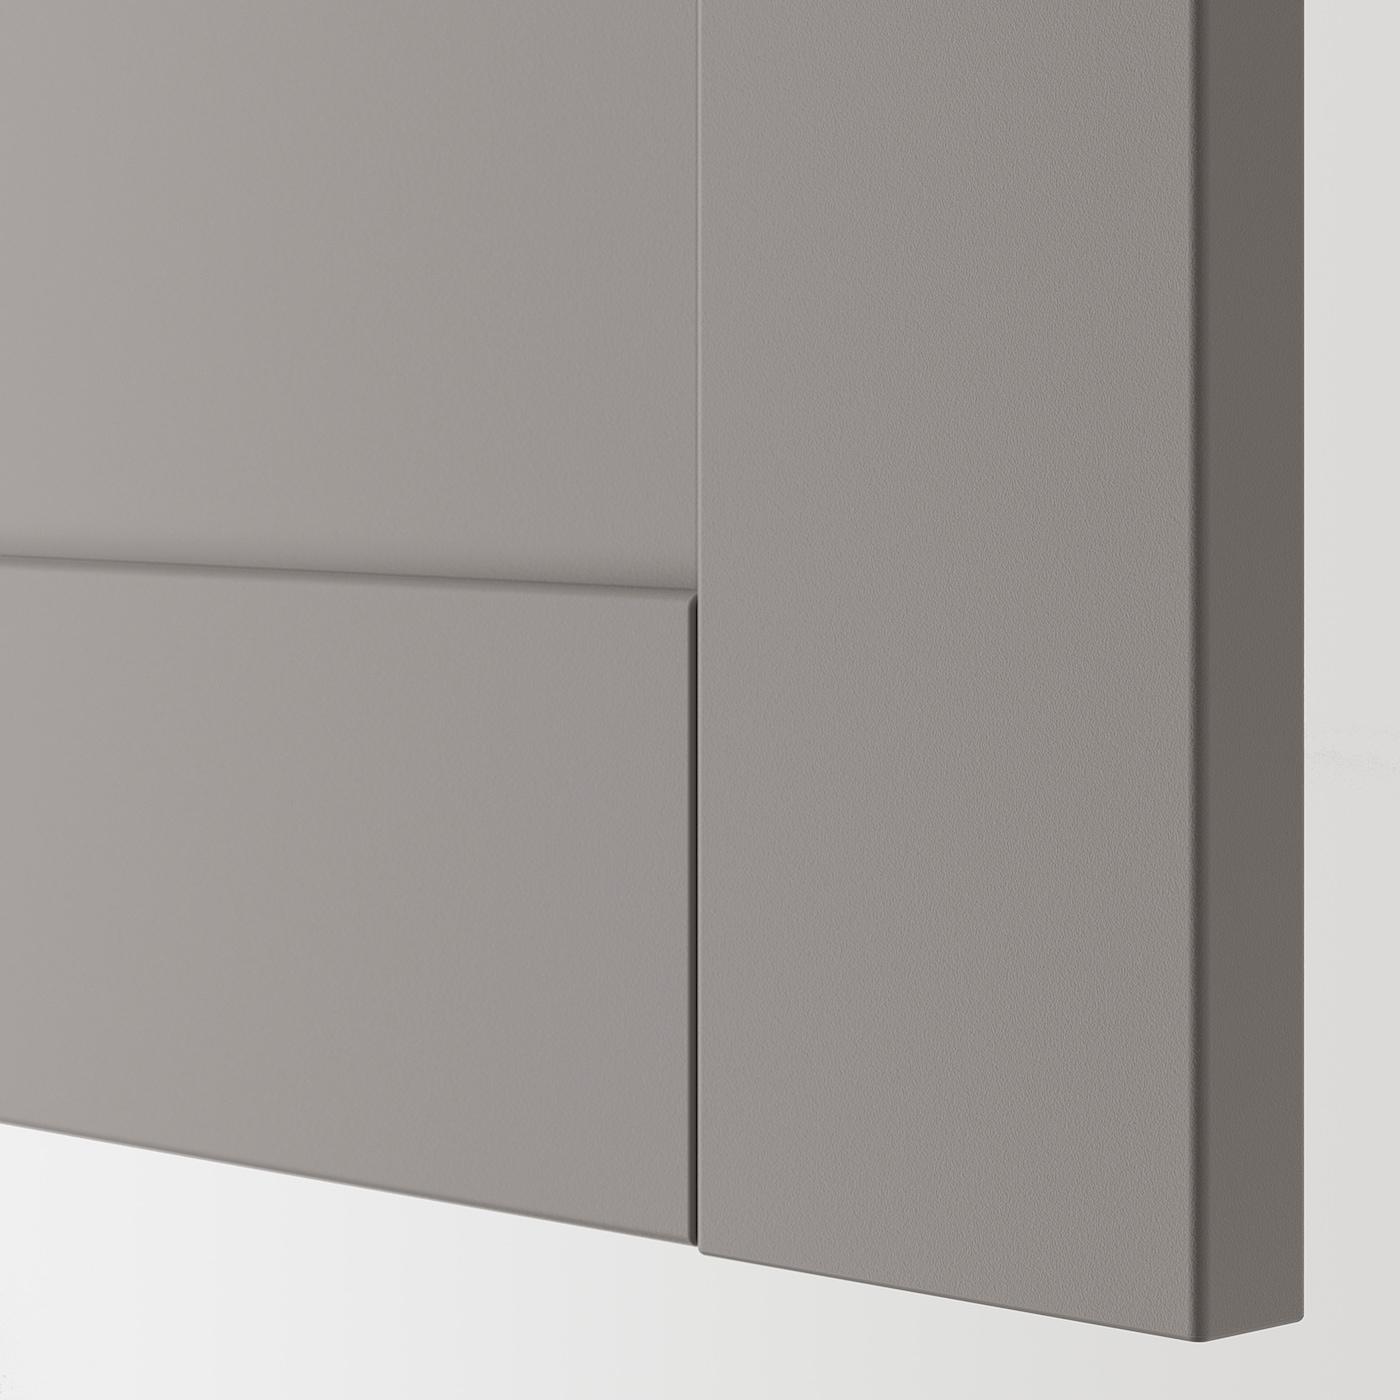 ENHET خزانة علوية مع 4 أرفف/باب, أبيض/رمادي هيكل, 30x32x180 سم